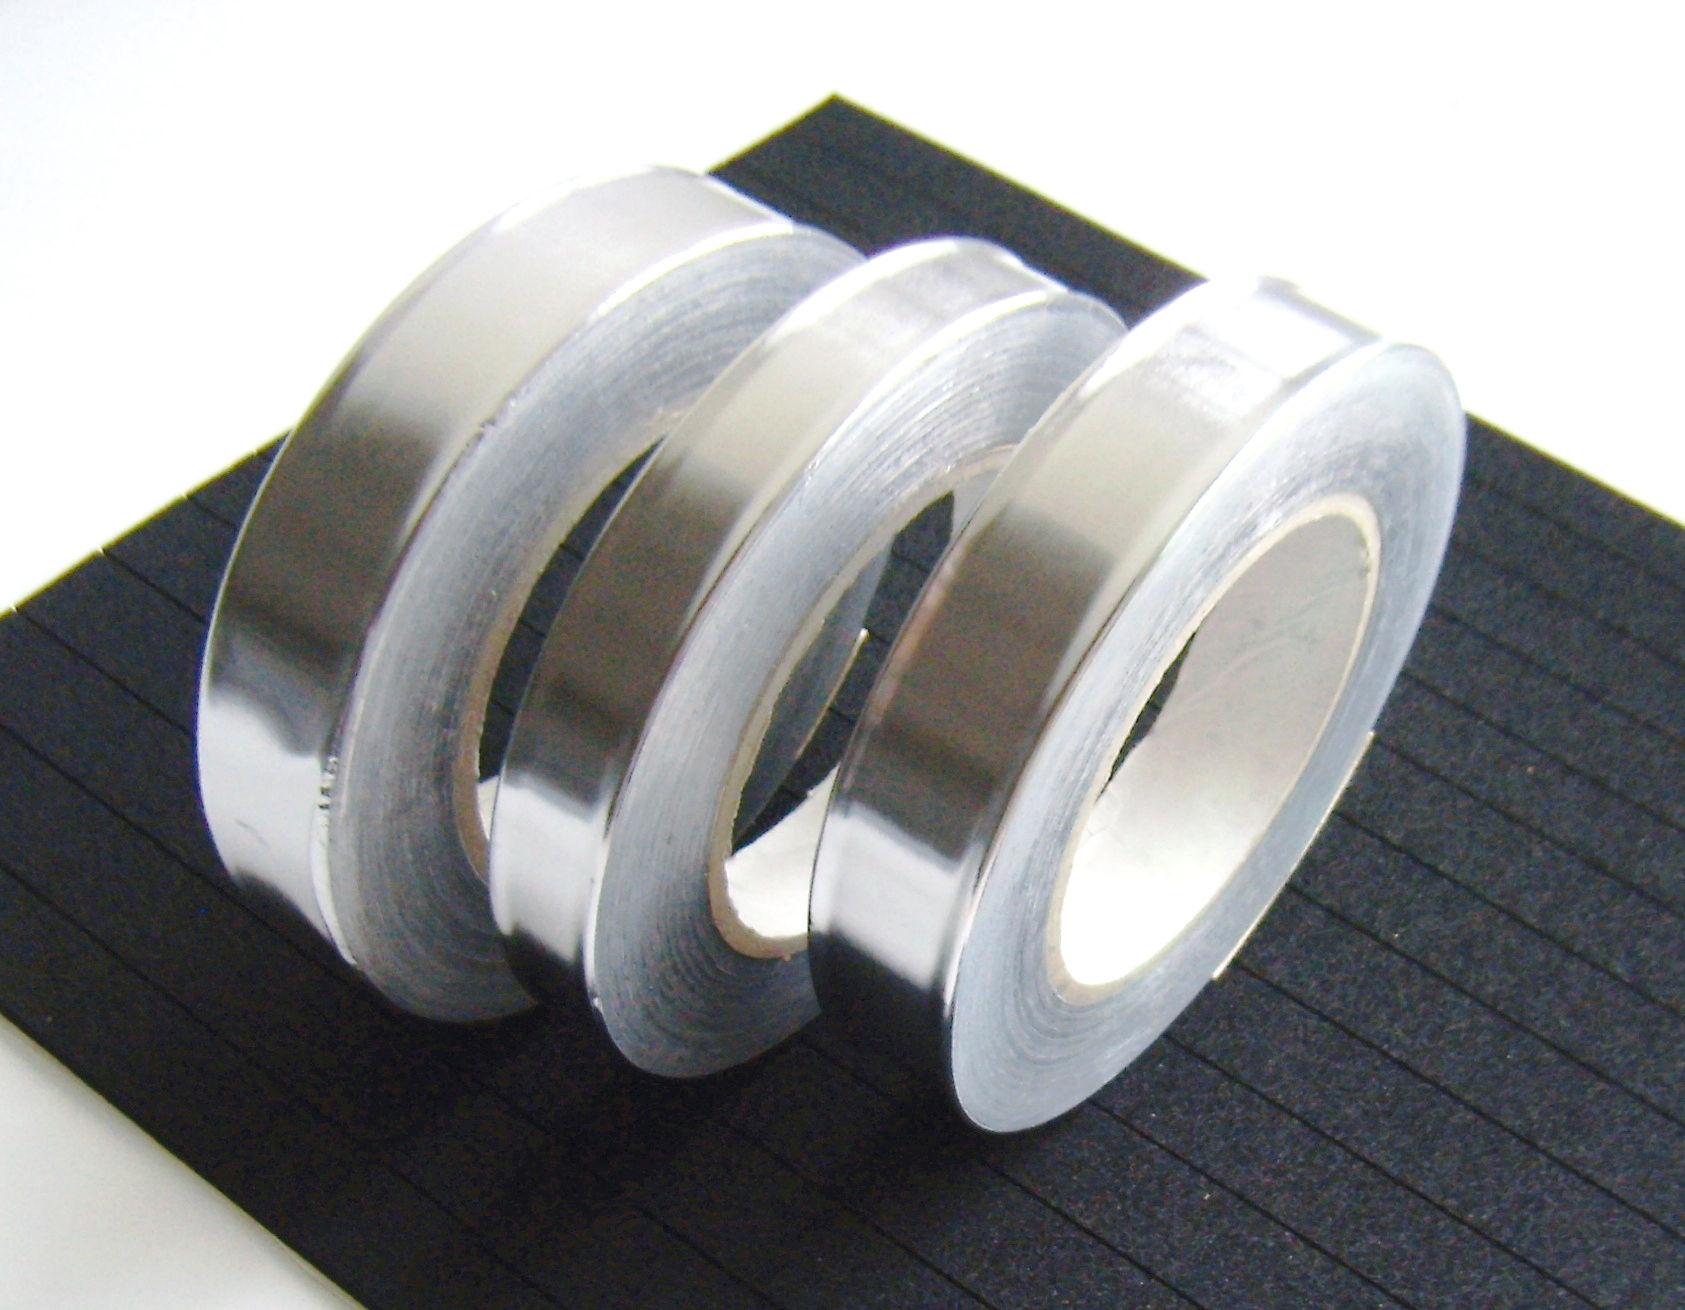 Cinta Adhesiva de Aluminio Cinta Adhesiva de Película